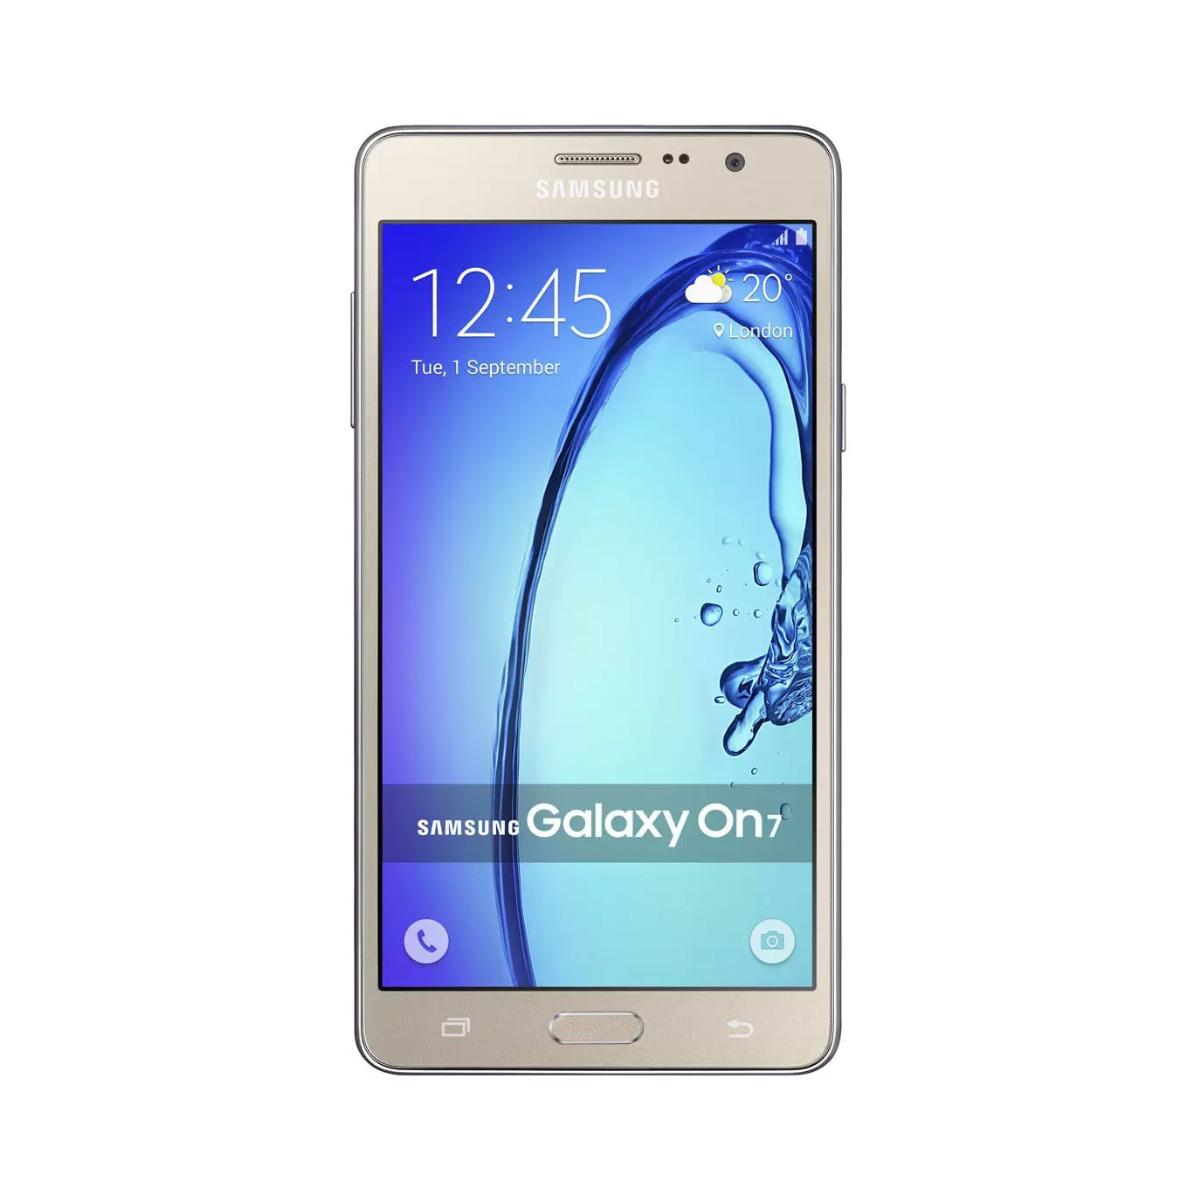 Samsung Galaxy On 7 G600 8gb Tela 5.5' Dual 13mp Usado